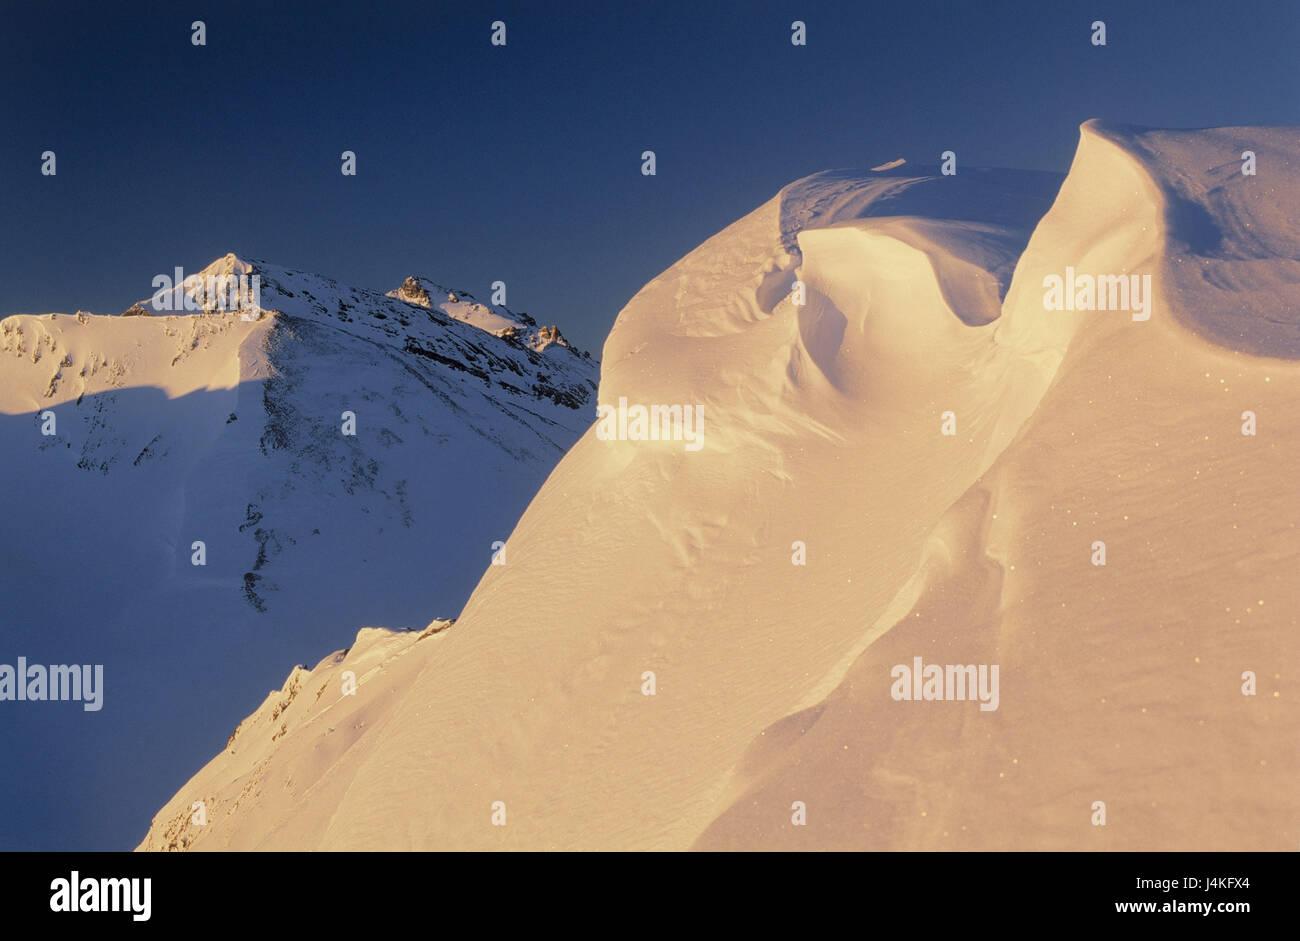 Austria, Tyrol, Silvretta, Ils Calcuogns, summit, Schneeverwehungen, evening light Europe, alps, mountain landscape, - Stock Image